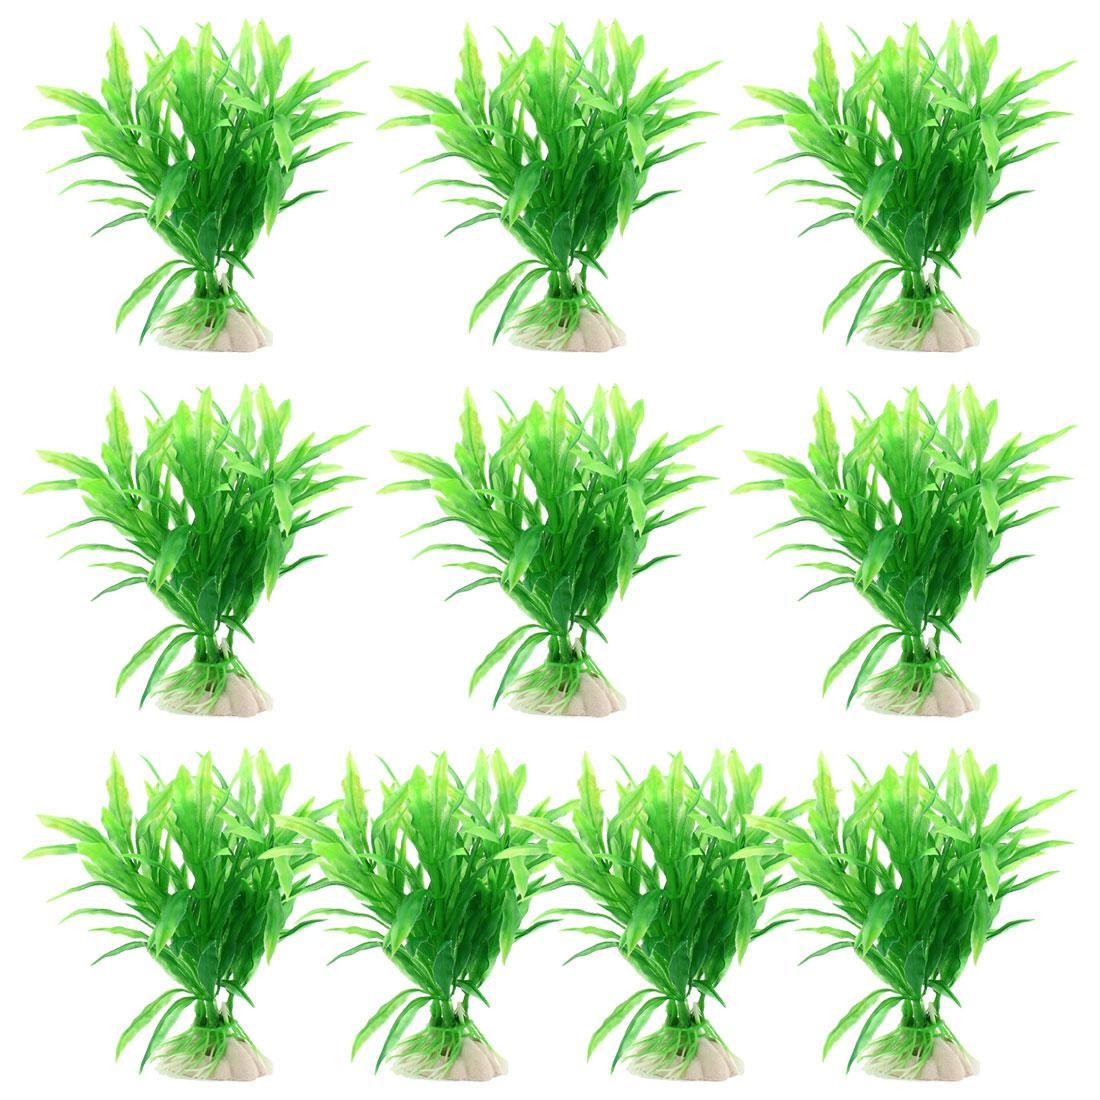 "10 Pcs 5.1"" High Underwater Plastic Plants Grass Green for Fish Tank Aquarium"